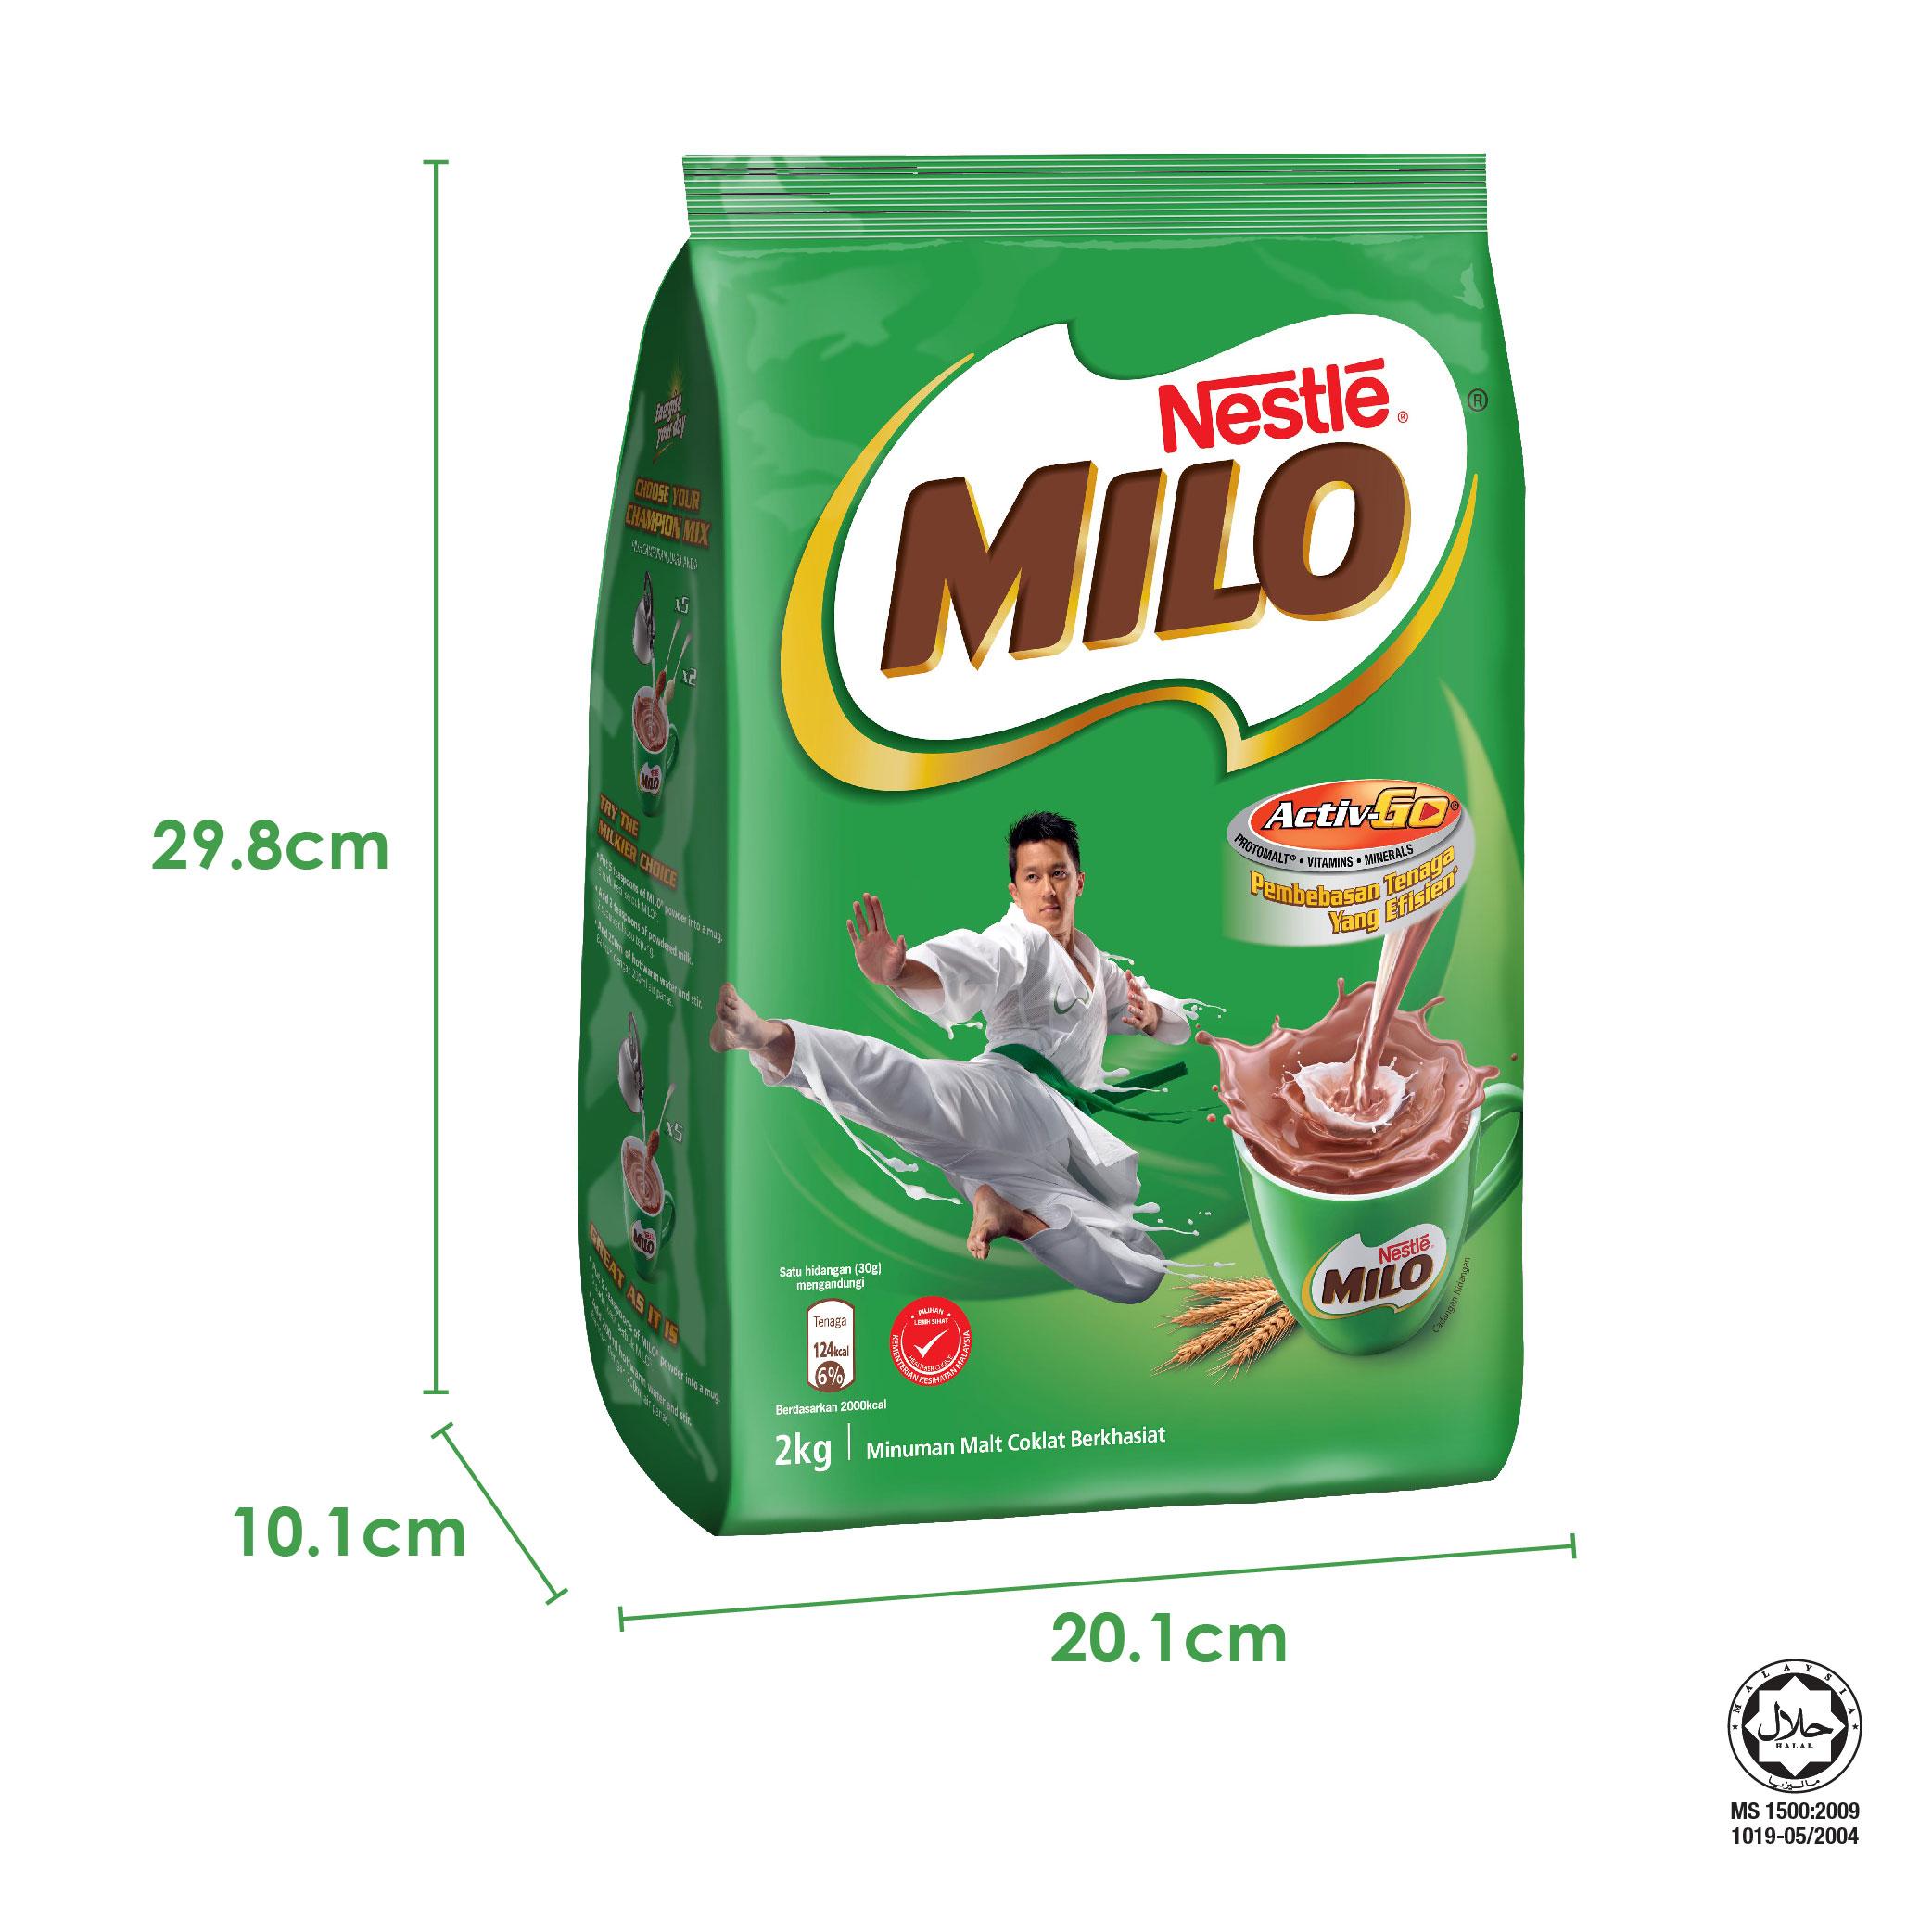 NESTLE MILO ACTIV-GO CHOCOLATE MALT POWDER Softpack 2kgX3